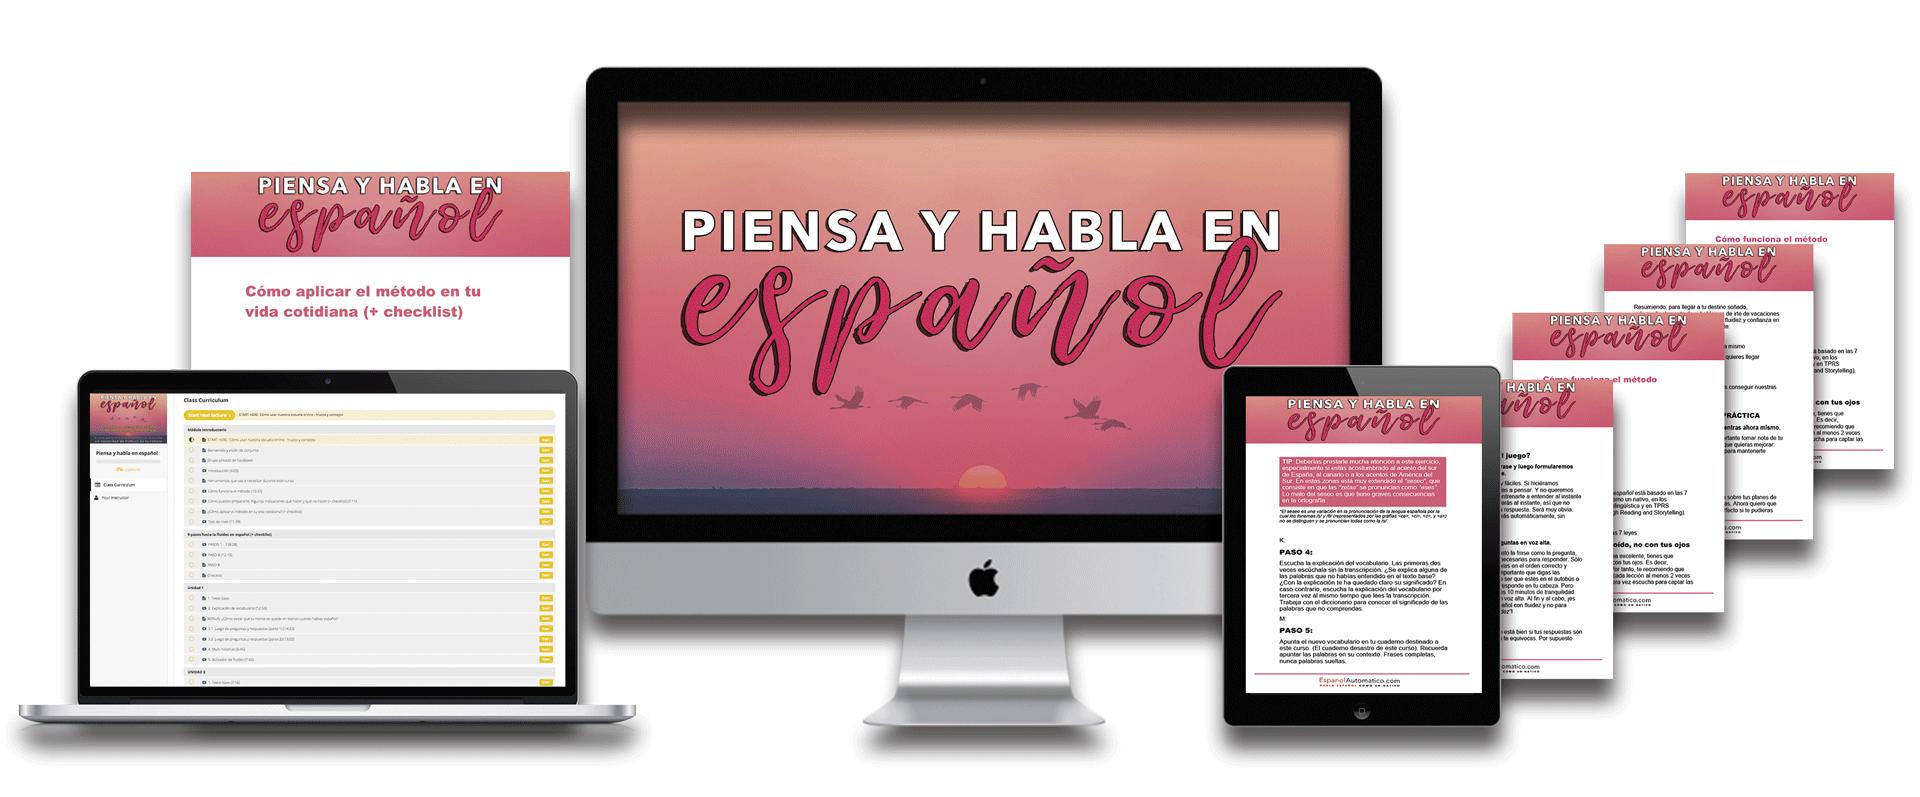 Pack 1: Habla español con fluidez   EspañolAutomatico